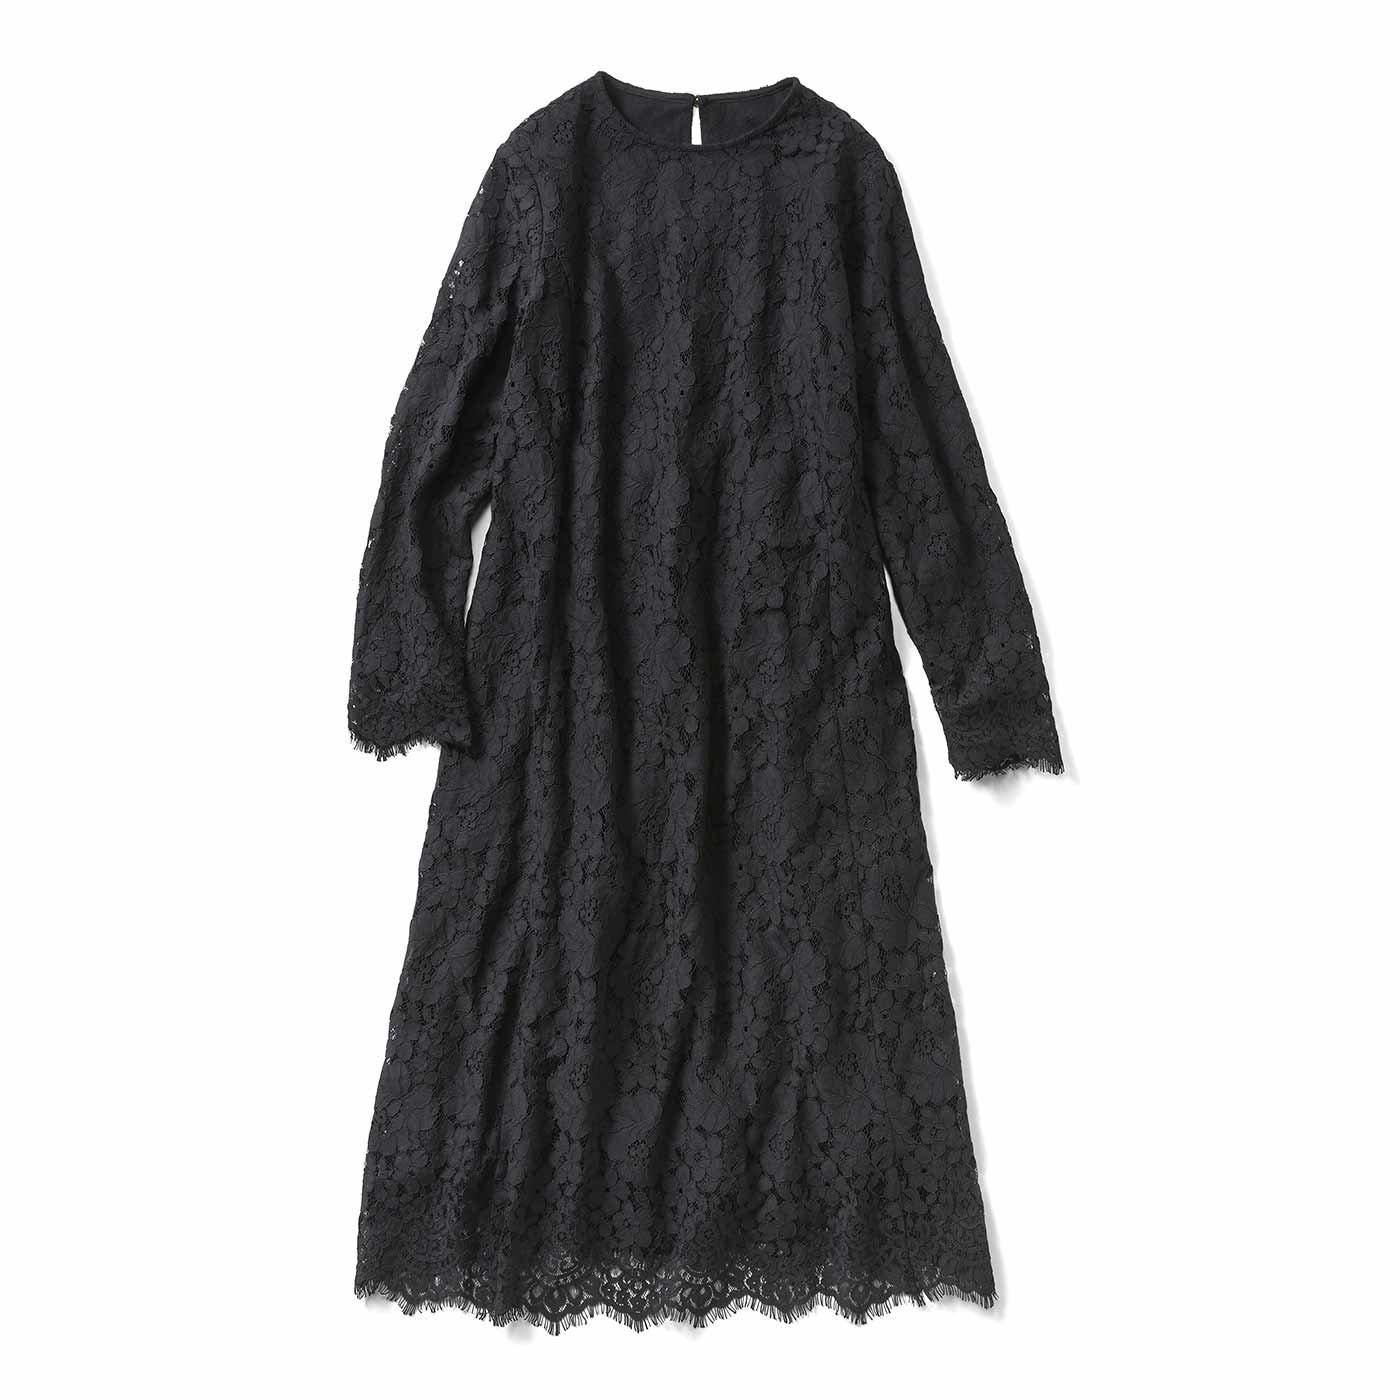 IEDIT[イディット] 裏起毛仕様のオールレースワンピース〈ブラック〉